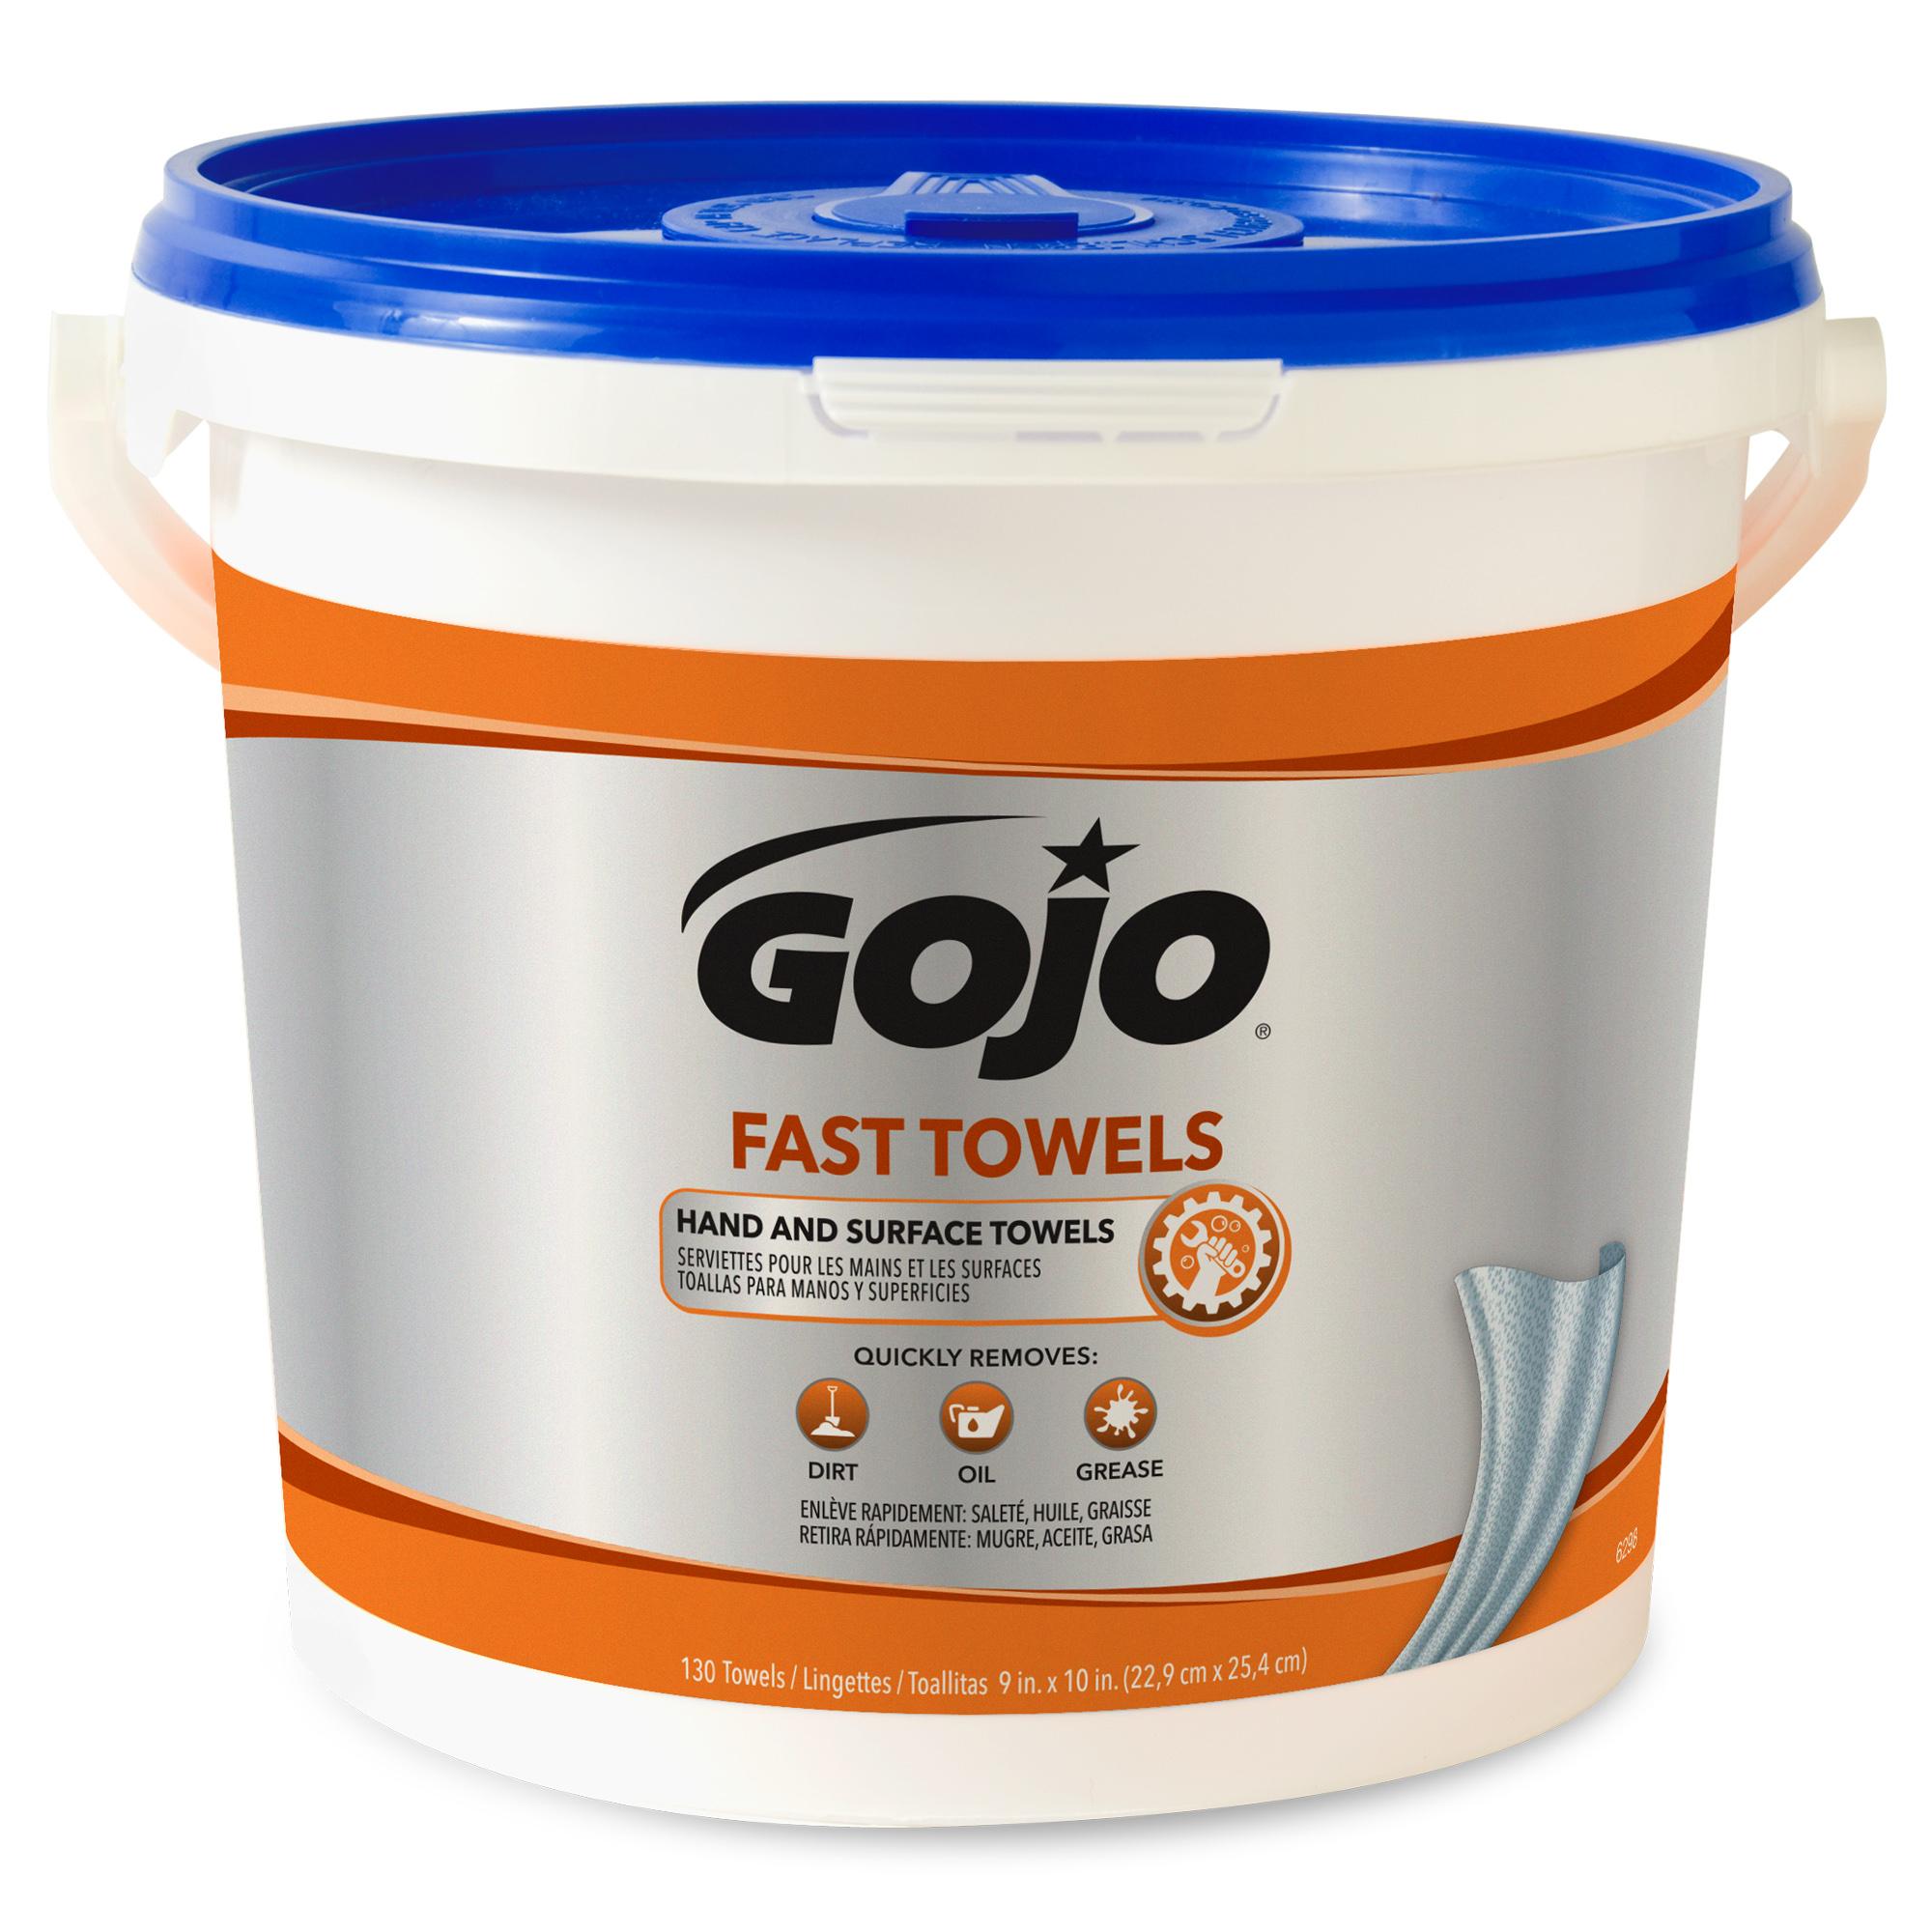 FAST TOWELS Hand Cleaning Towels, 7 3/4 x 11, 130/Bucket, 4 Buckets/Carton - GOJ6298